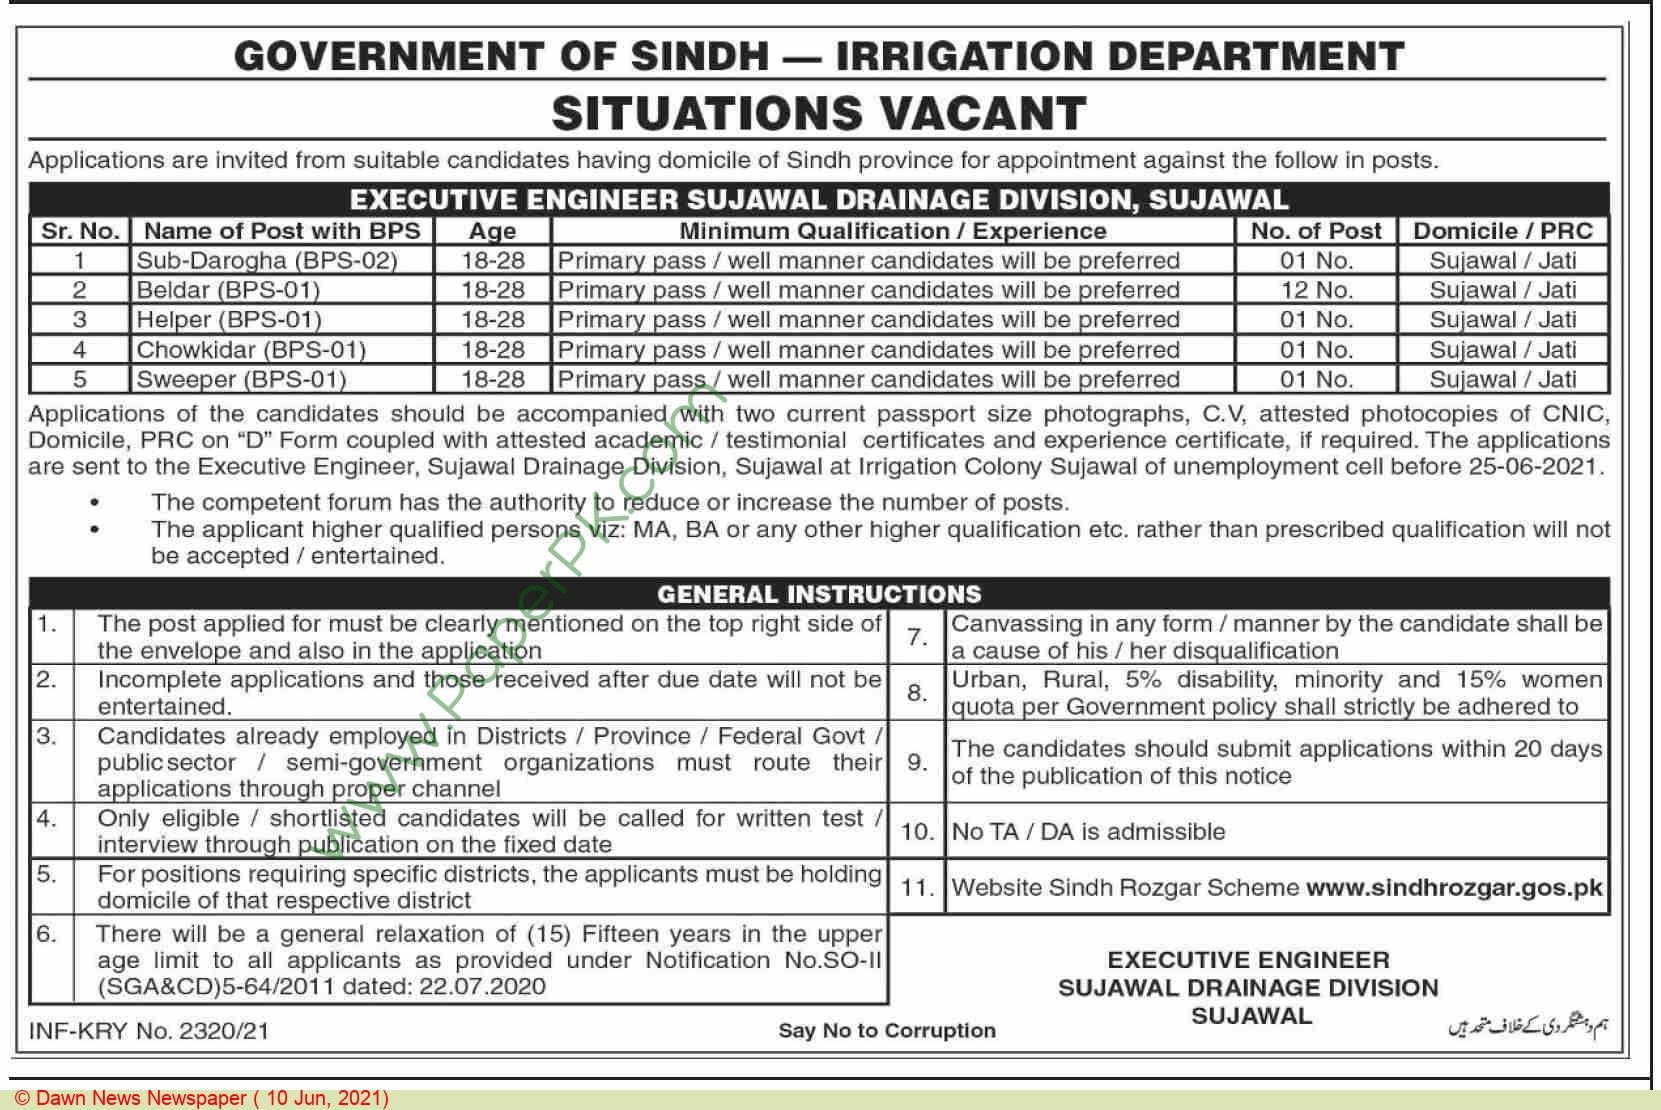 Irrigation Department jobs newspaper ad for Chowkidar in Sujawal on 2021-06-10